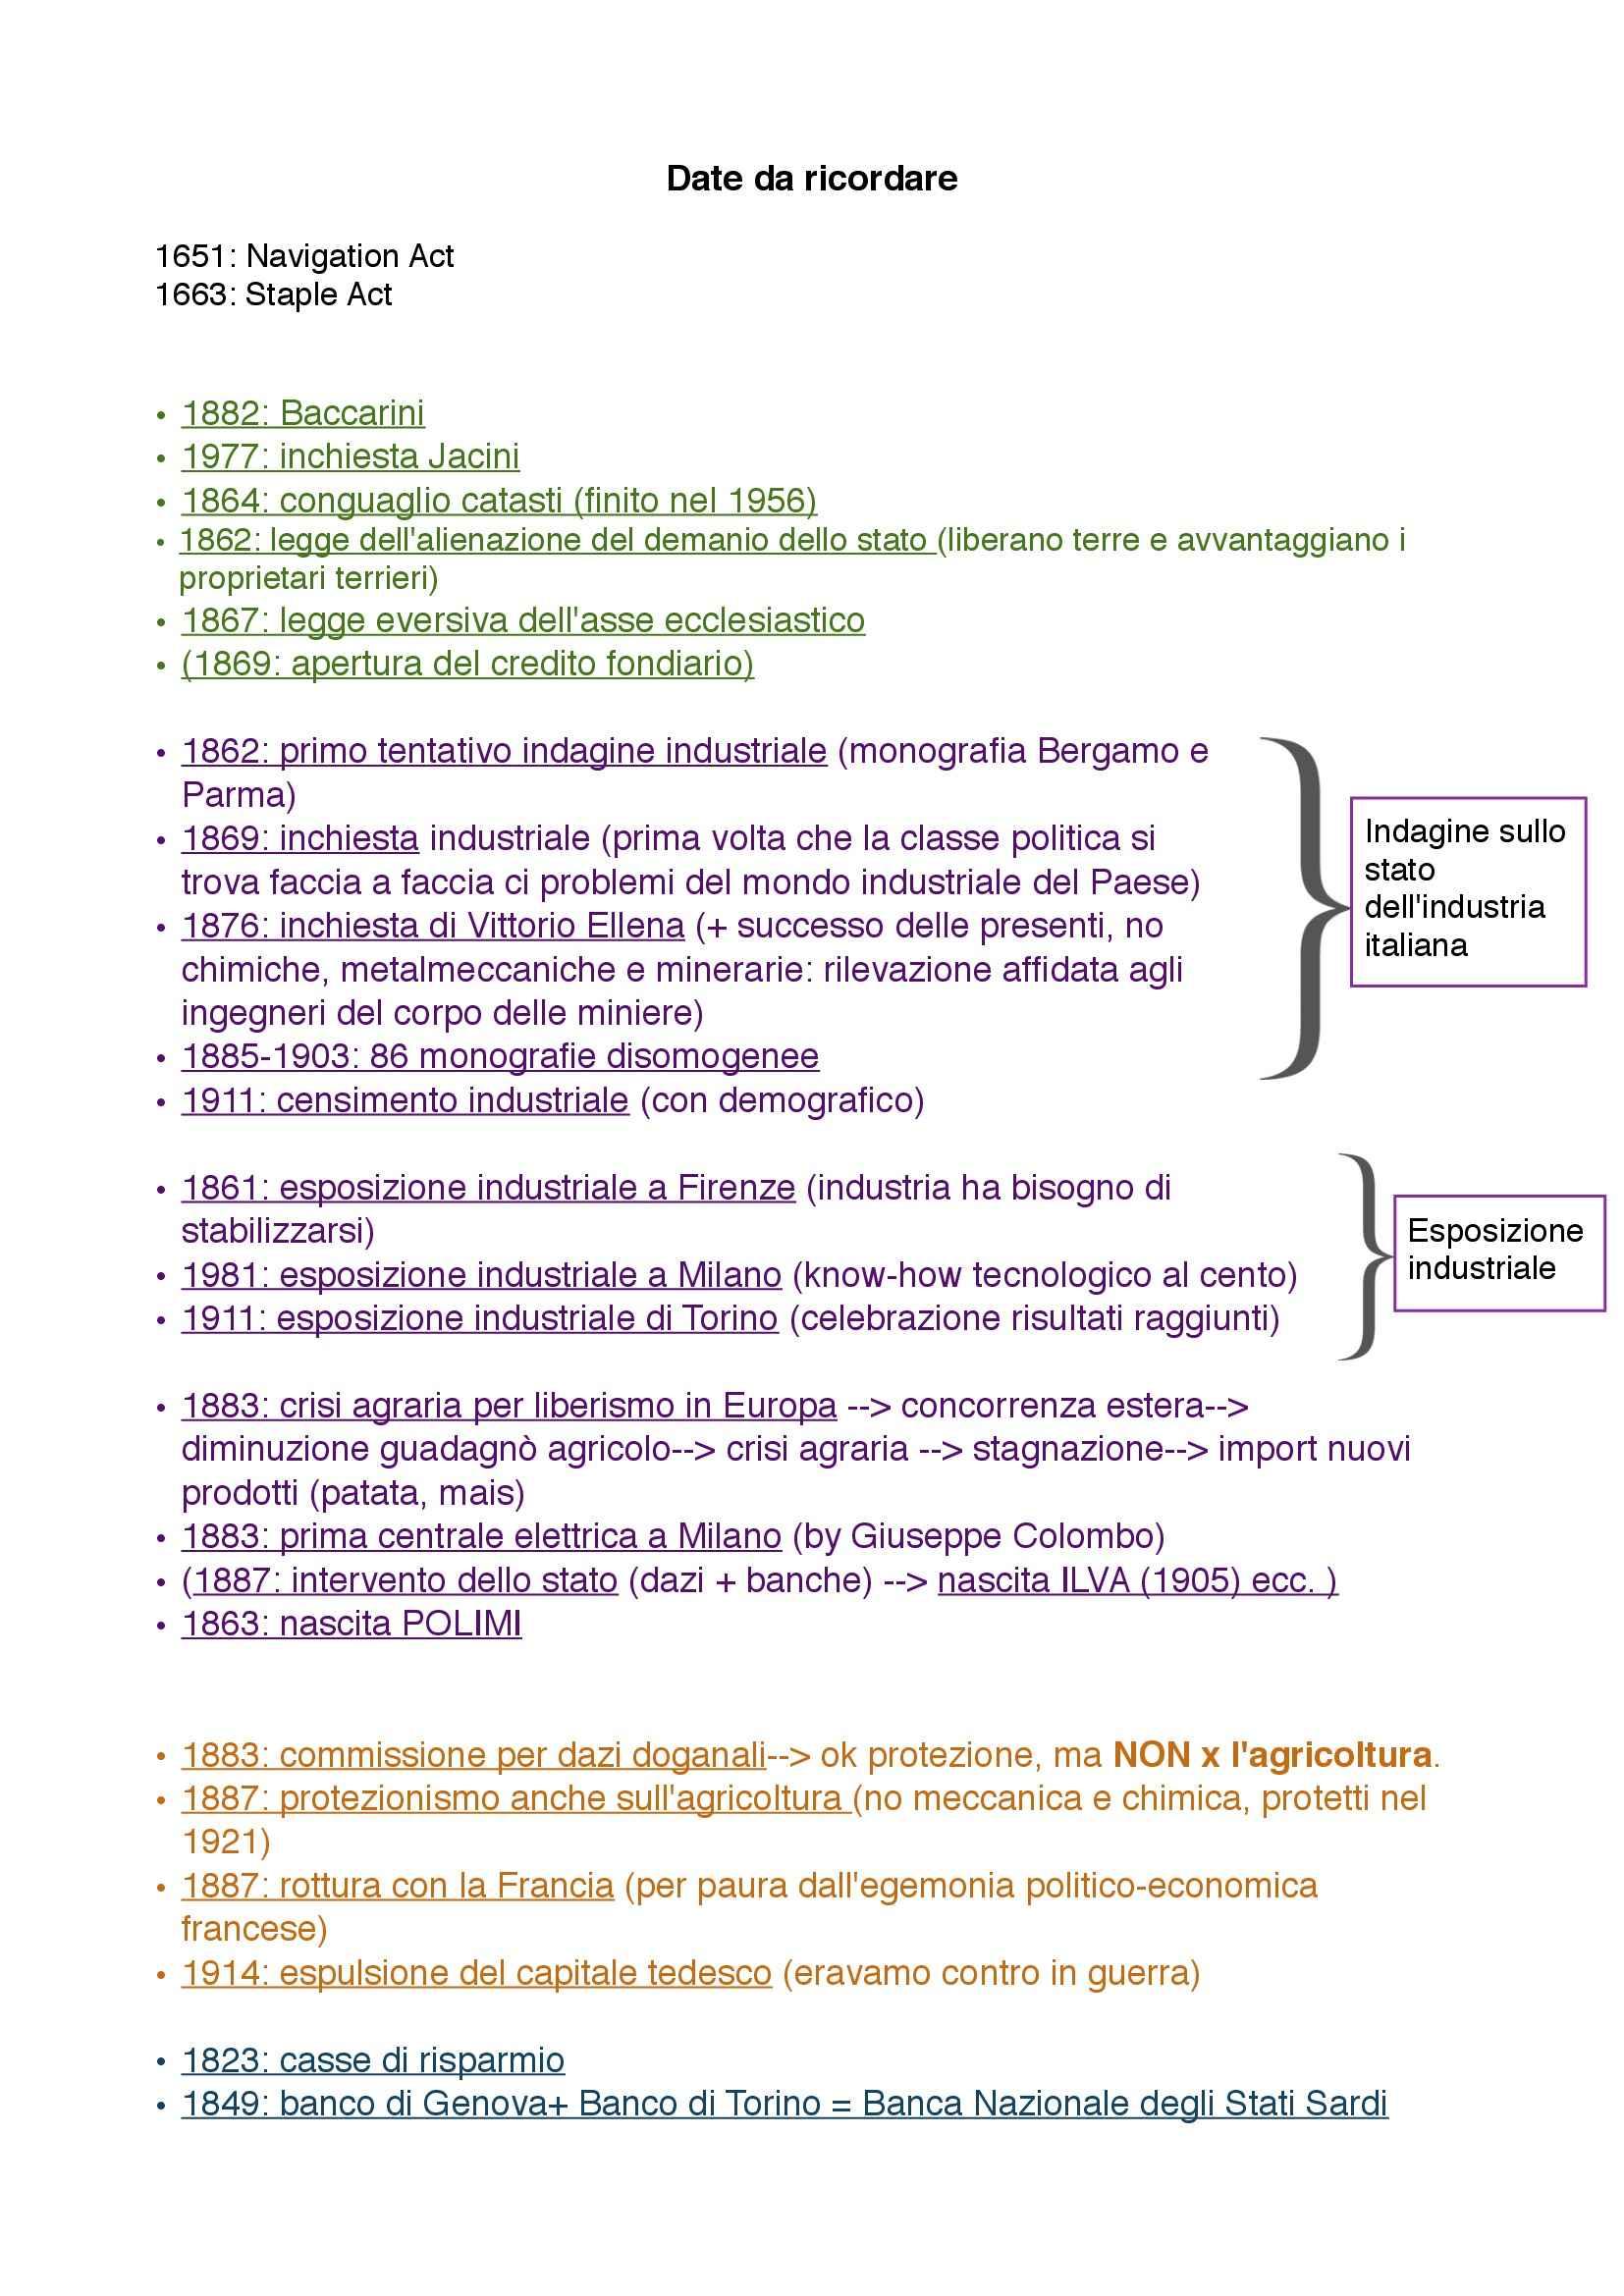 Date da sapere - cronologia eventi storia economica II parziale